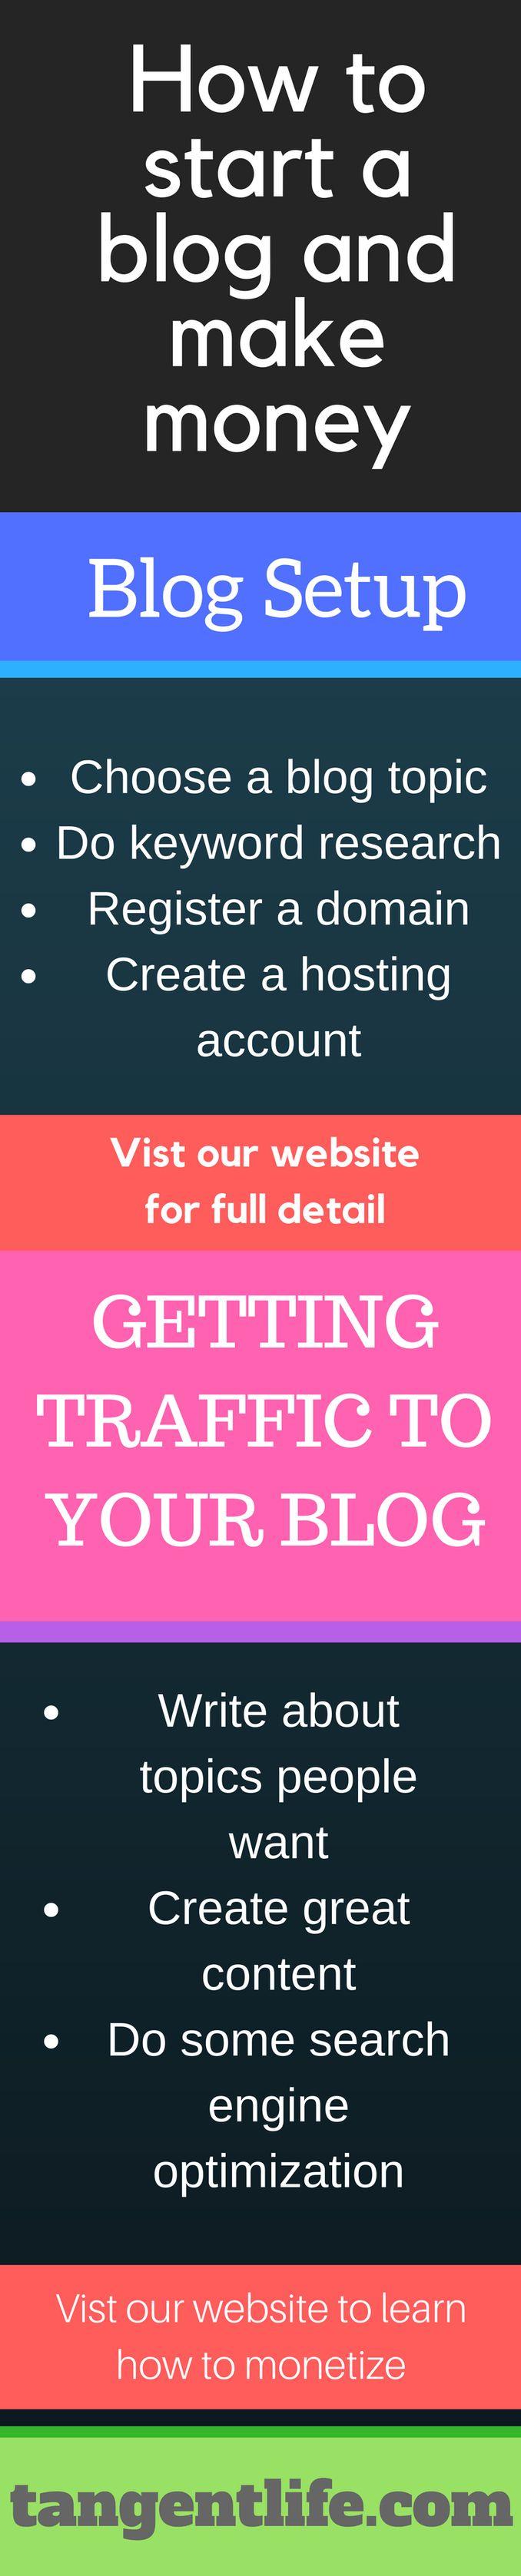 How to start a blog #blogging #blogger #blog how to start a blog and make money how to start a blog for beginners how to start a blog for free how to start a blog lifestyle how to start a blog how to start a blog for teens how to start a blog step by step how to start a blog on instagram how to start a blog for profit how to start a blog today how to start a blog from scratch how to start a blog cheap how to start a blog for dummies how to start a blog inspiration how to start a blog ideas